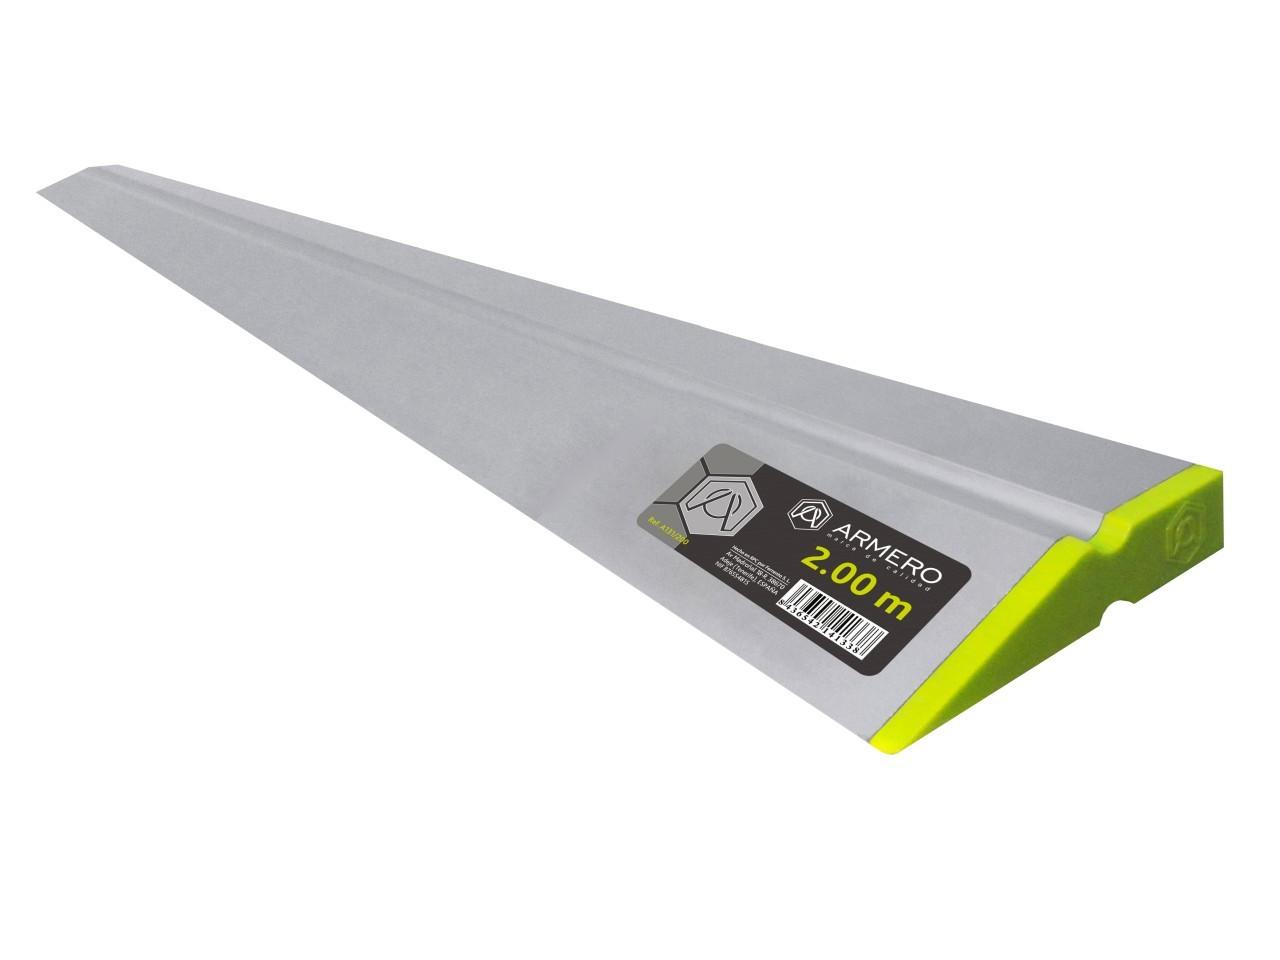 Правило алюминиевое A131/200, 2.0м